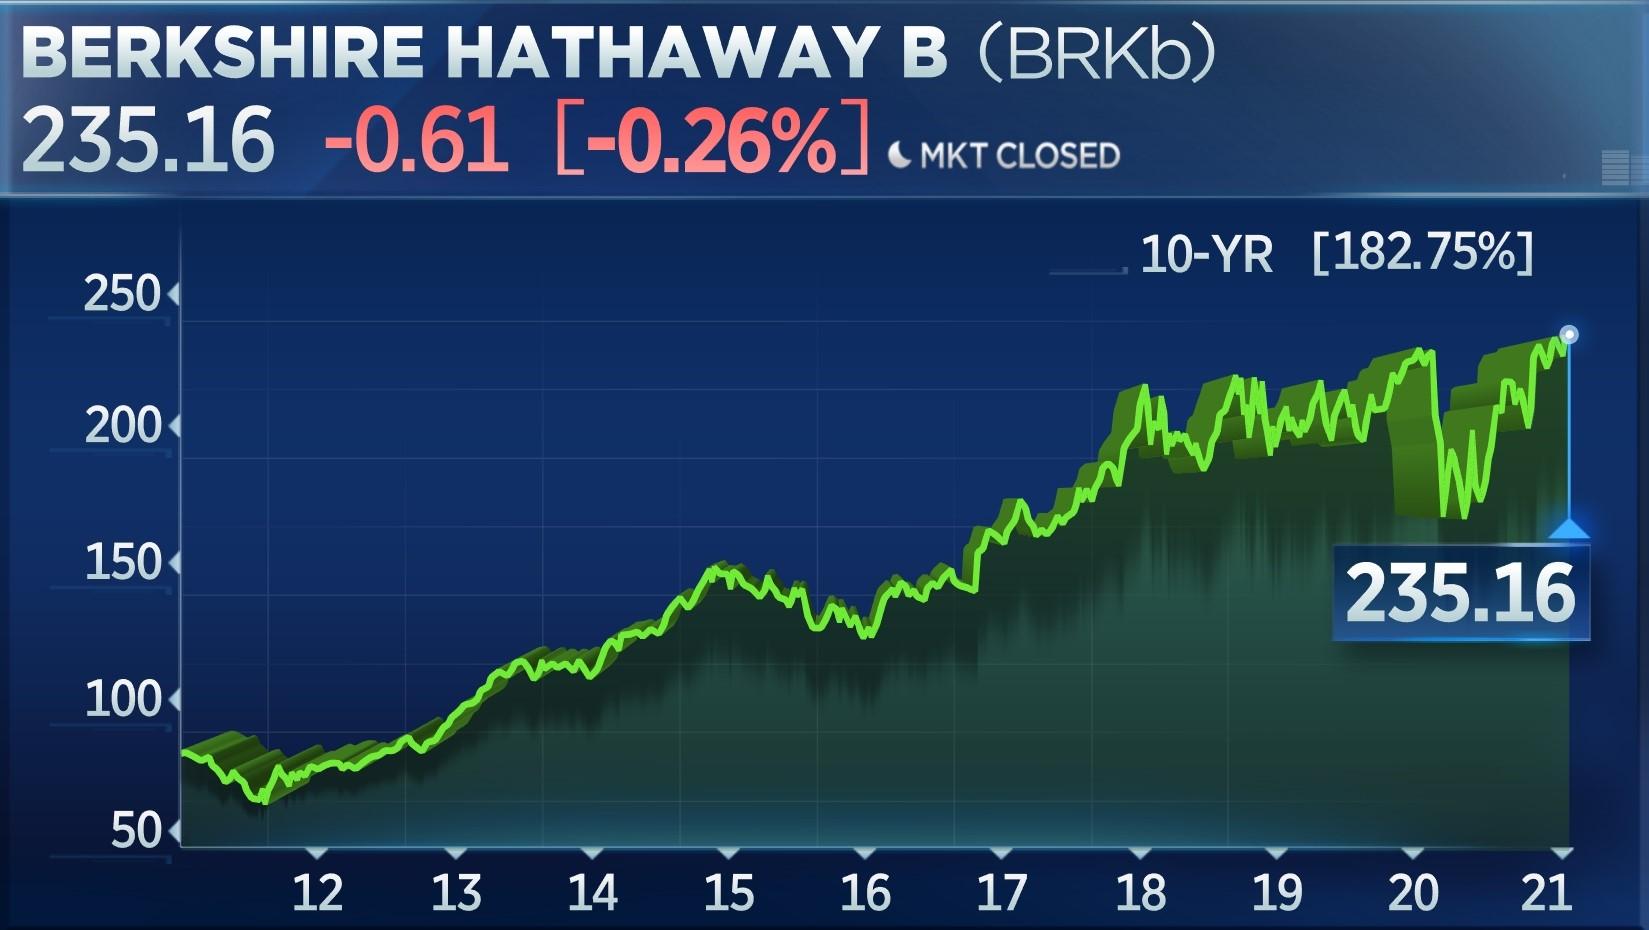 Berkshire Hathaway B 10-year chart